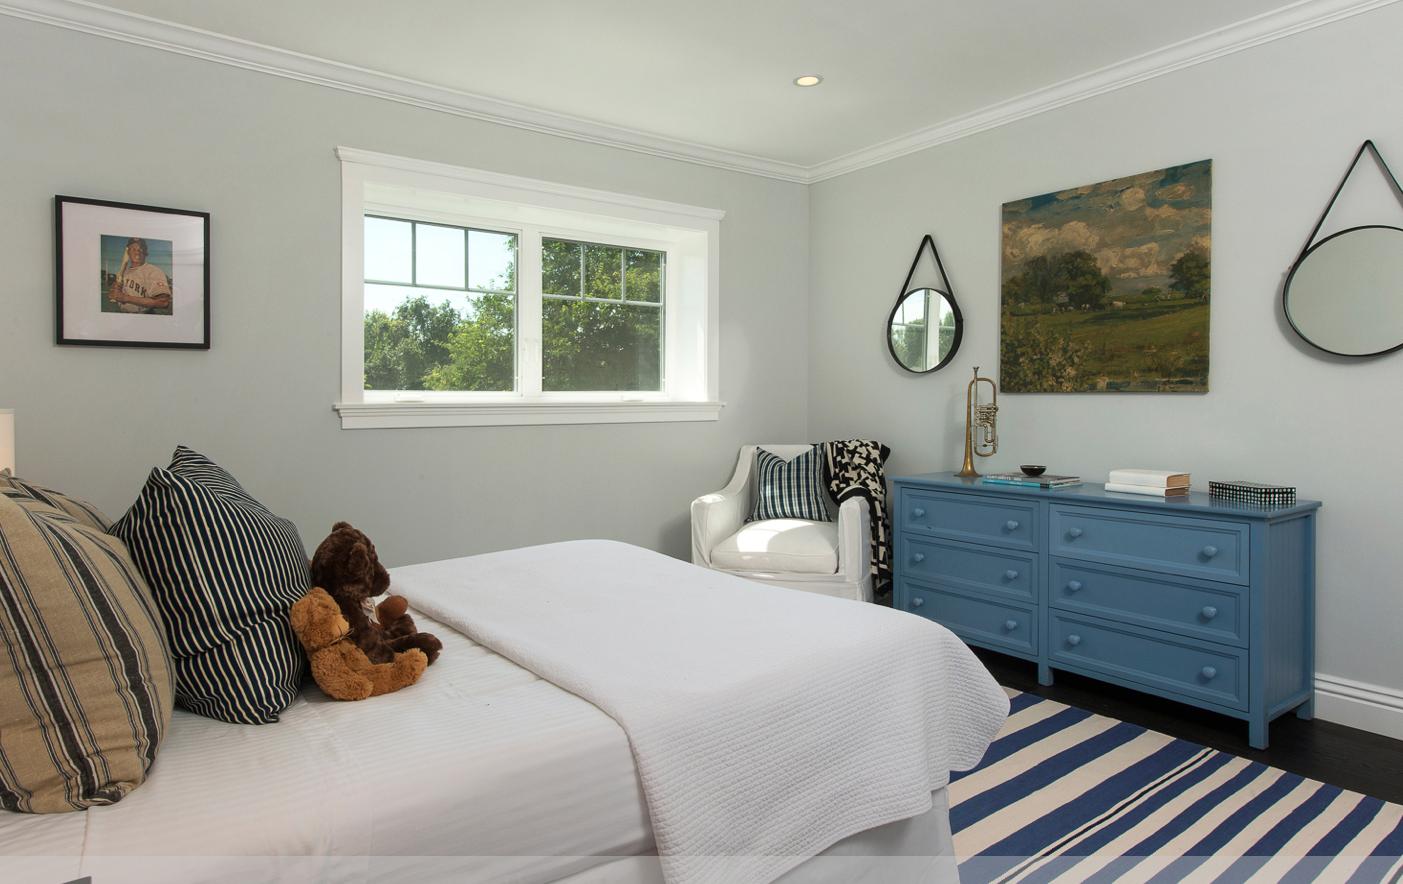 grown up boys room | Crib design, Boys bedrooms, Home